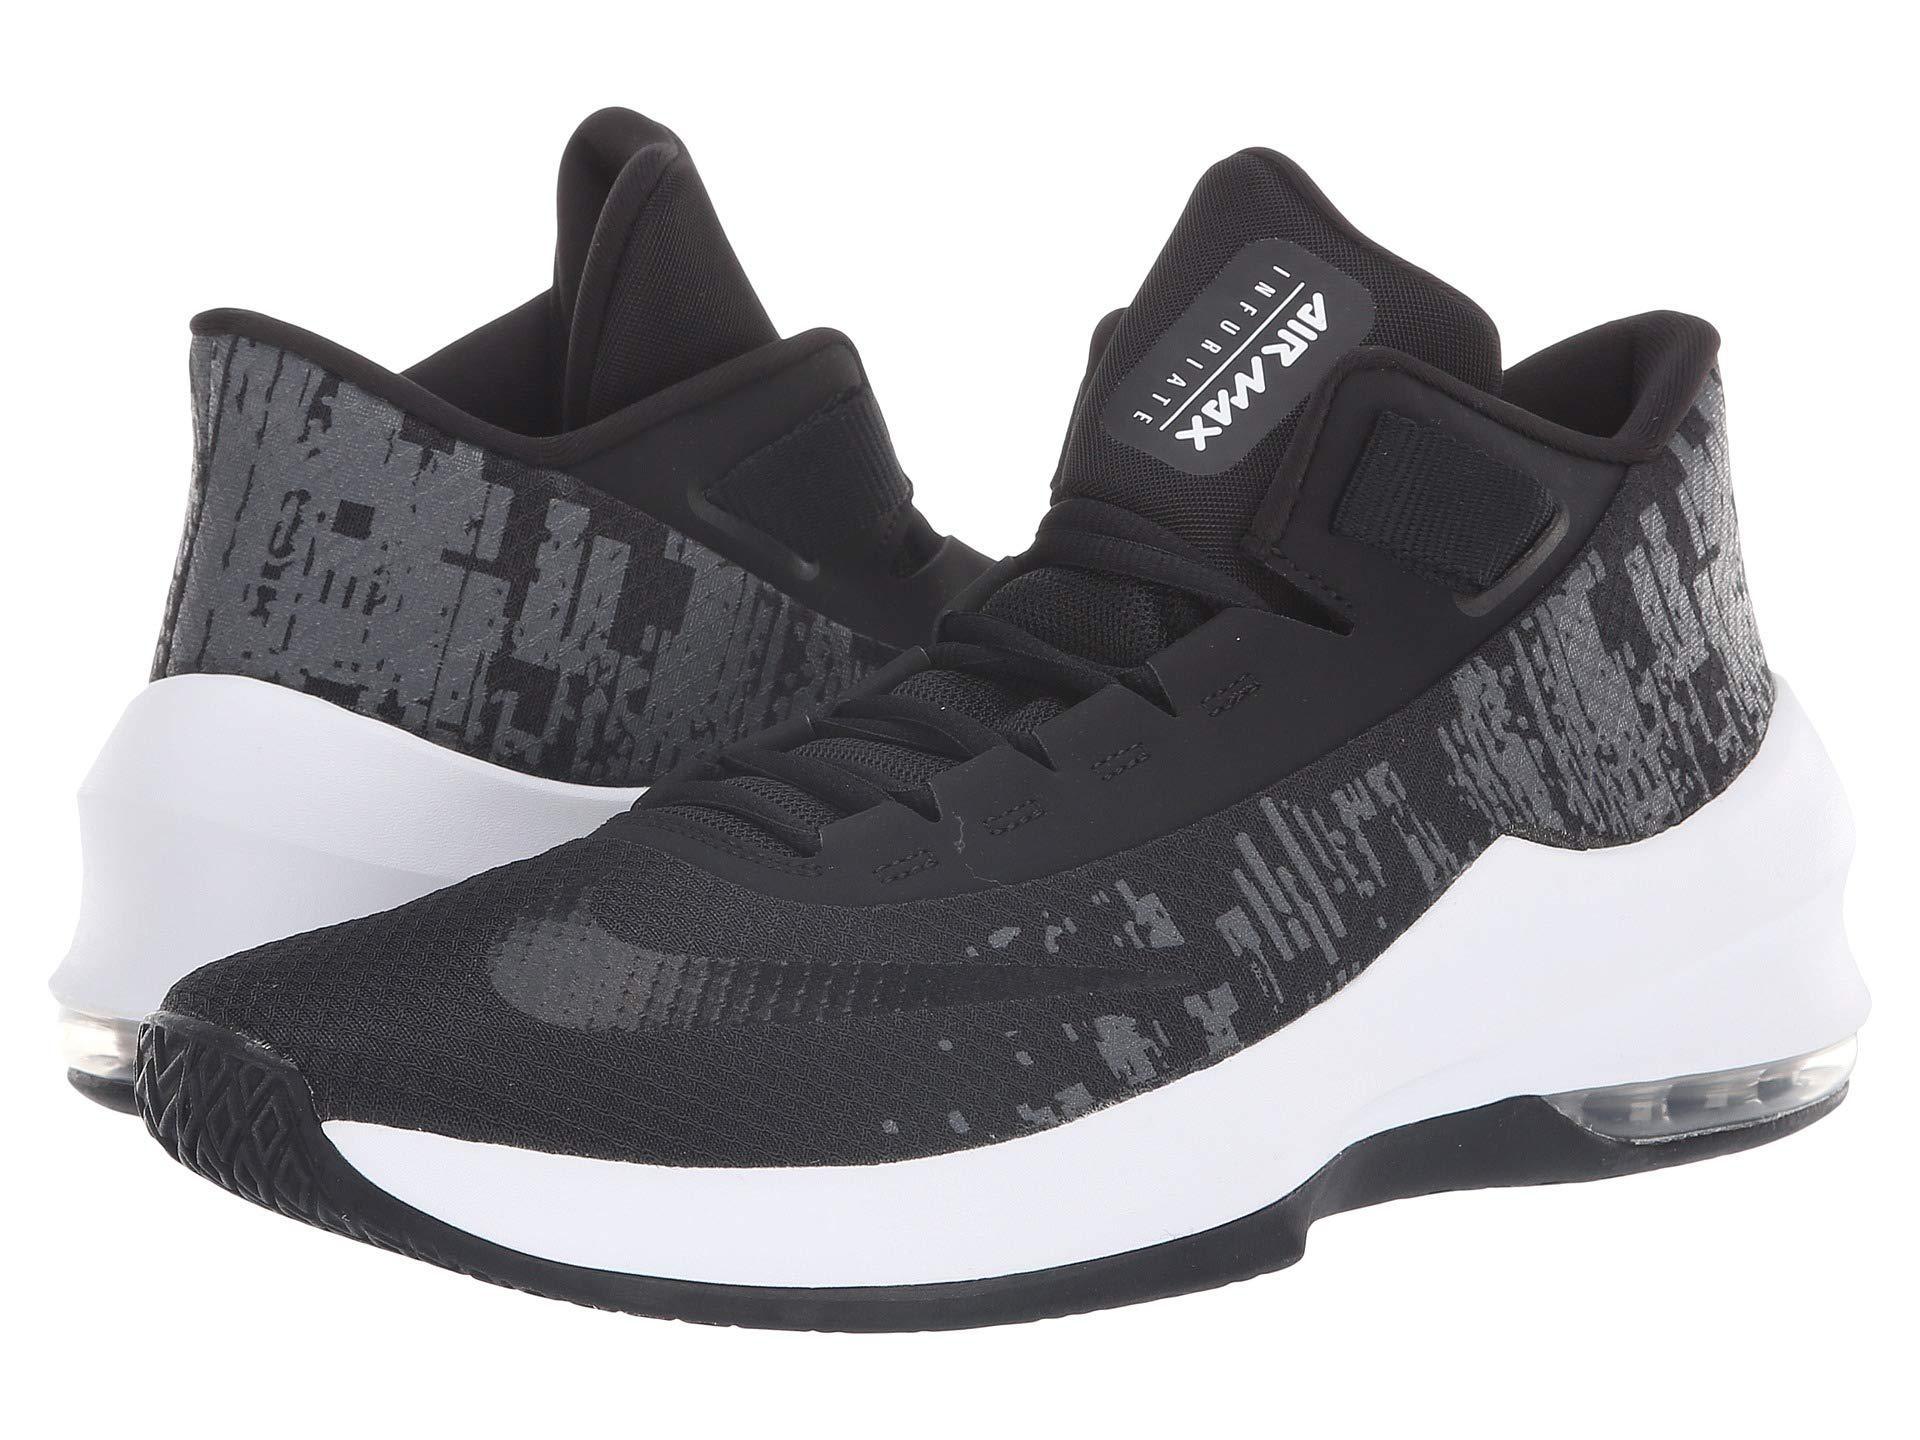 uk availability 4e609 edbd3 Nike - Air Max Infuriate 2 Mid (black university Red anthracite) Men s.  View fullscreen